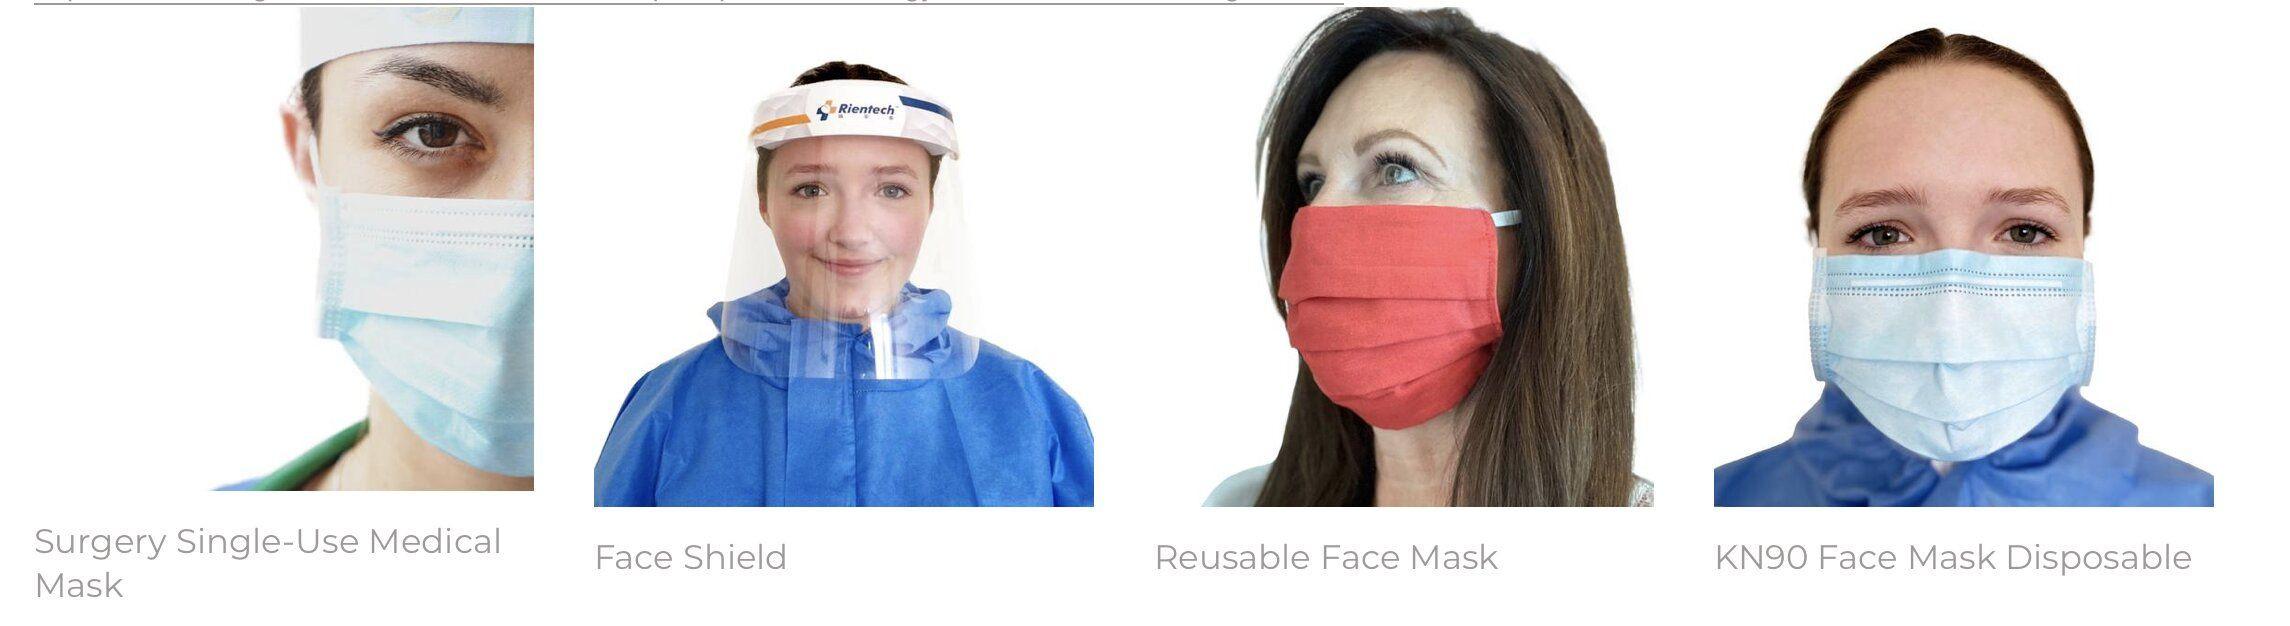 KN90, KN95, 3M, Children's Facemasks, face shields, nitrile gloves